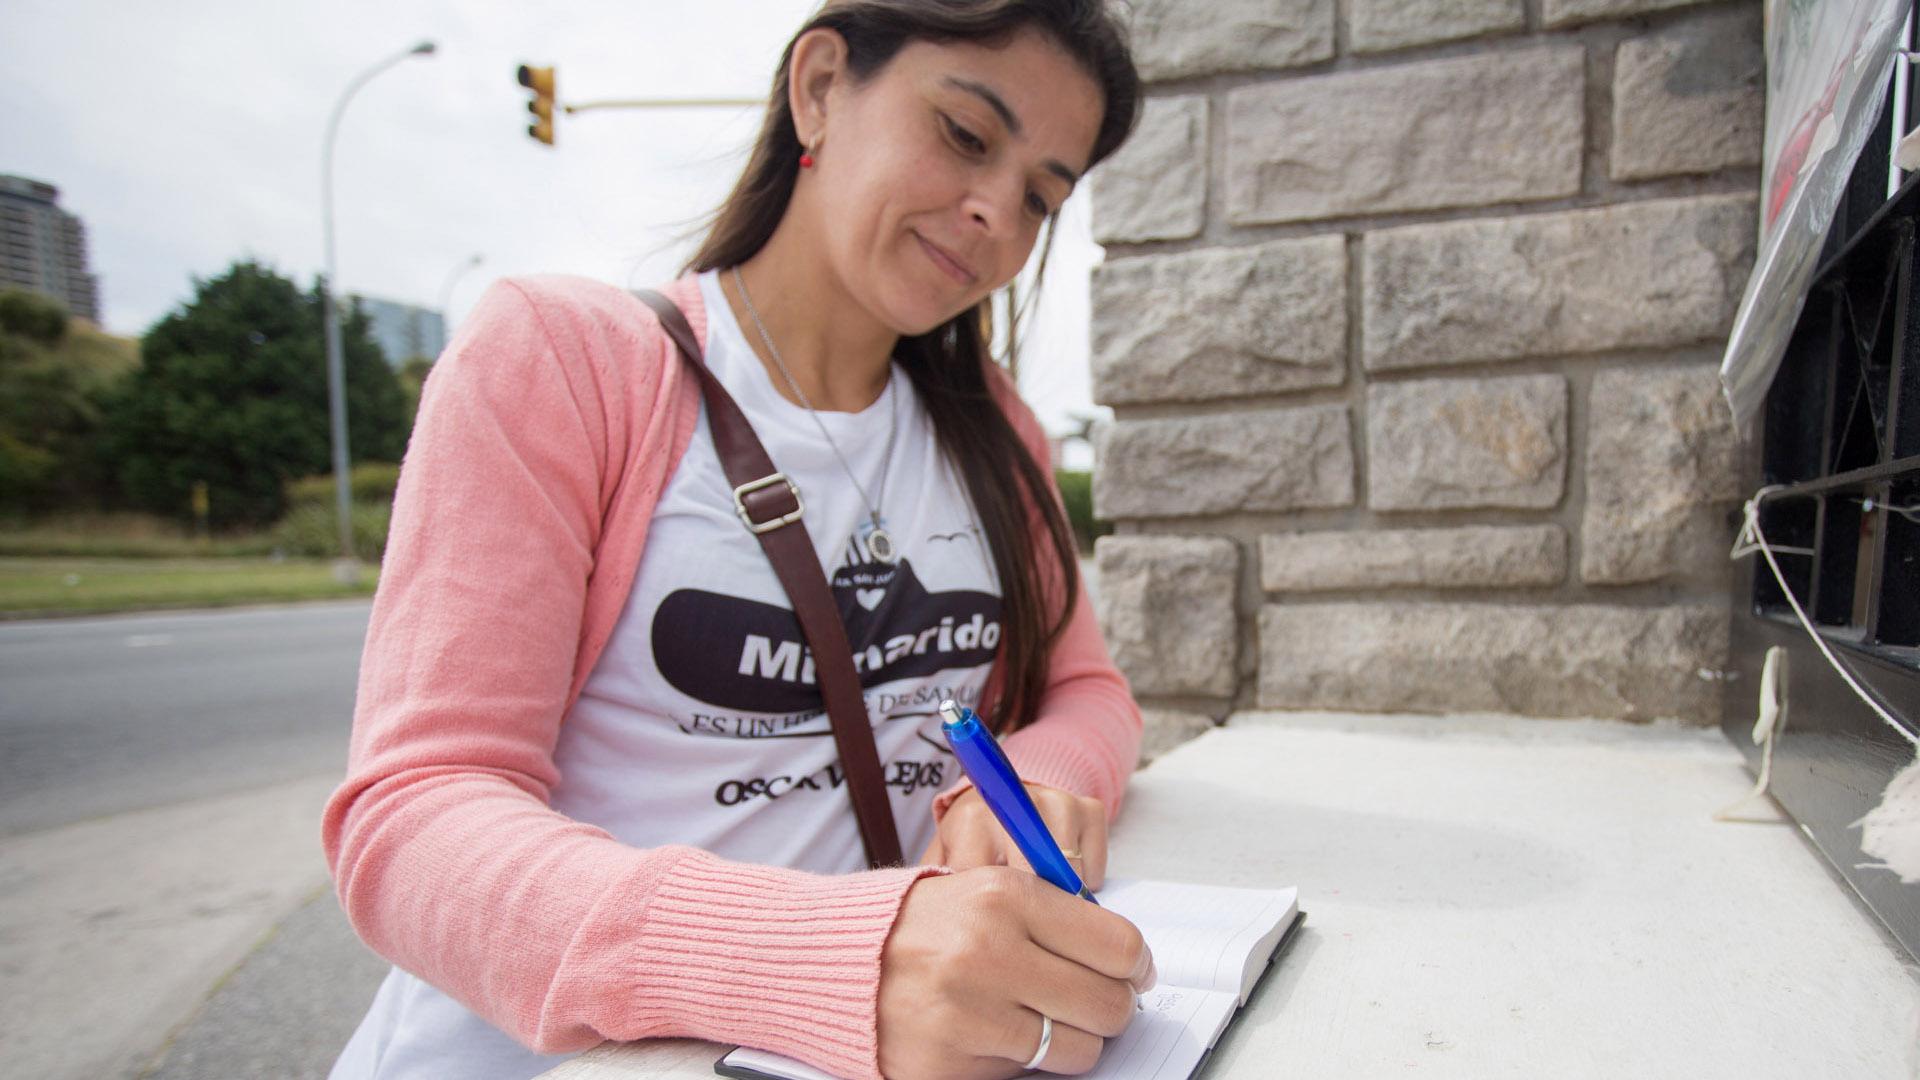 Paola escribe en la puerta de la Base Naval de Mar del Plata (Christian Heit)